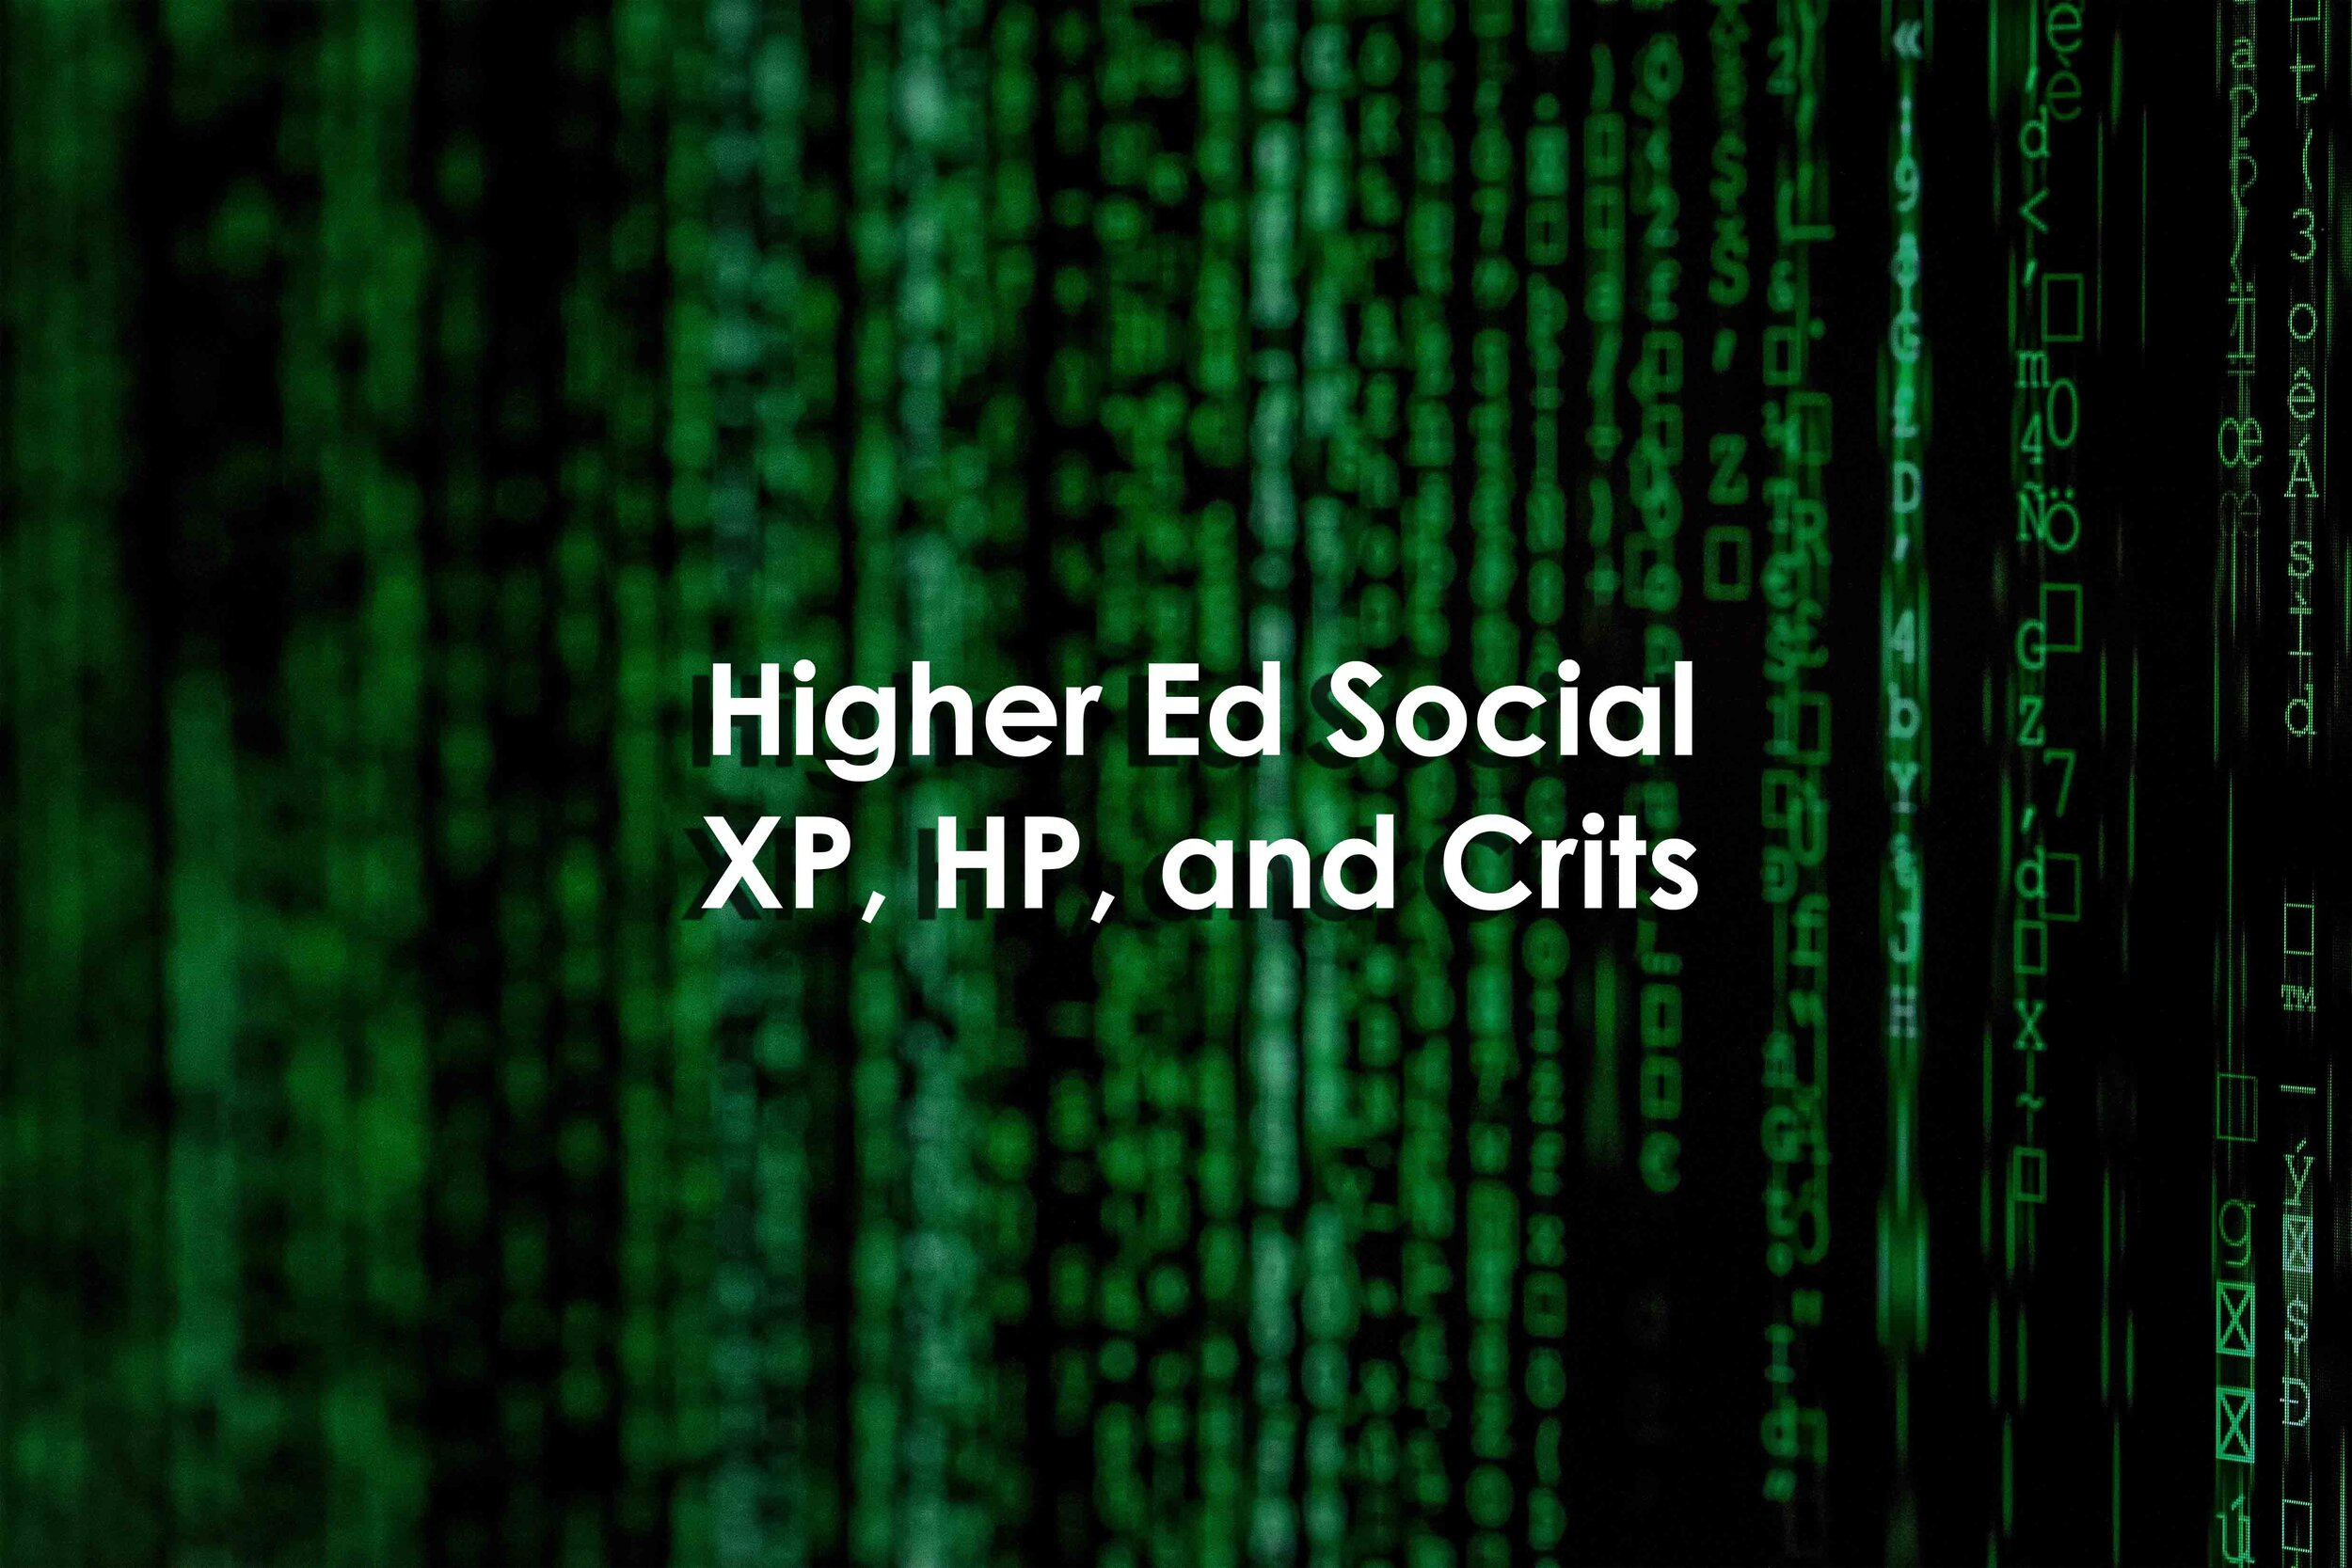 Higher Ed Social XP, HP, and Crits